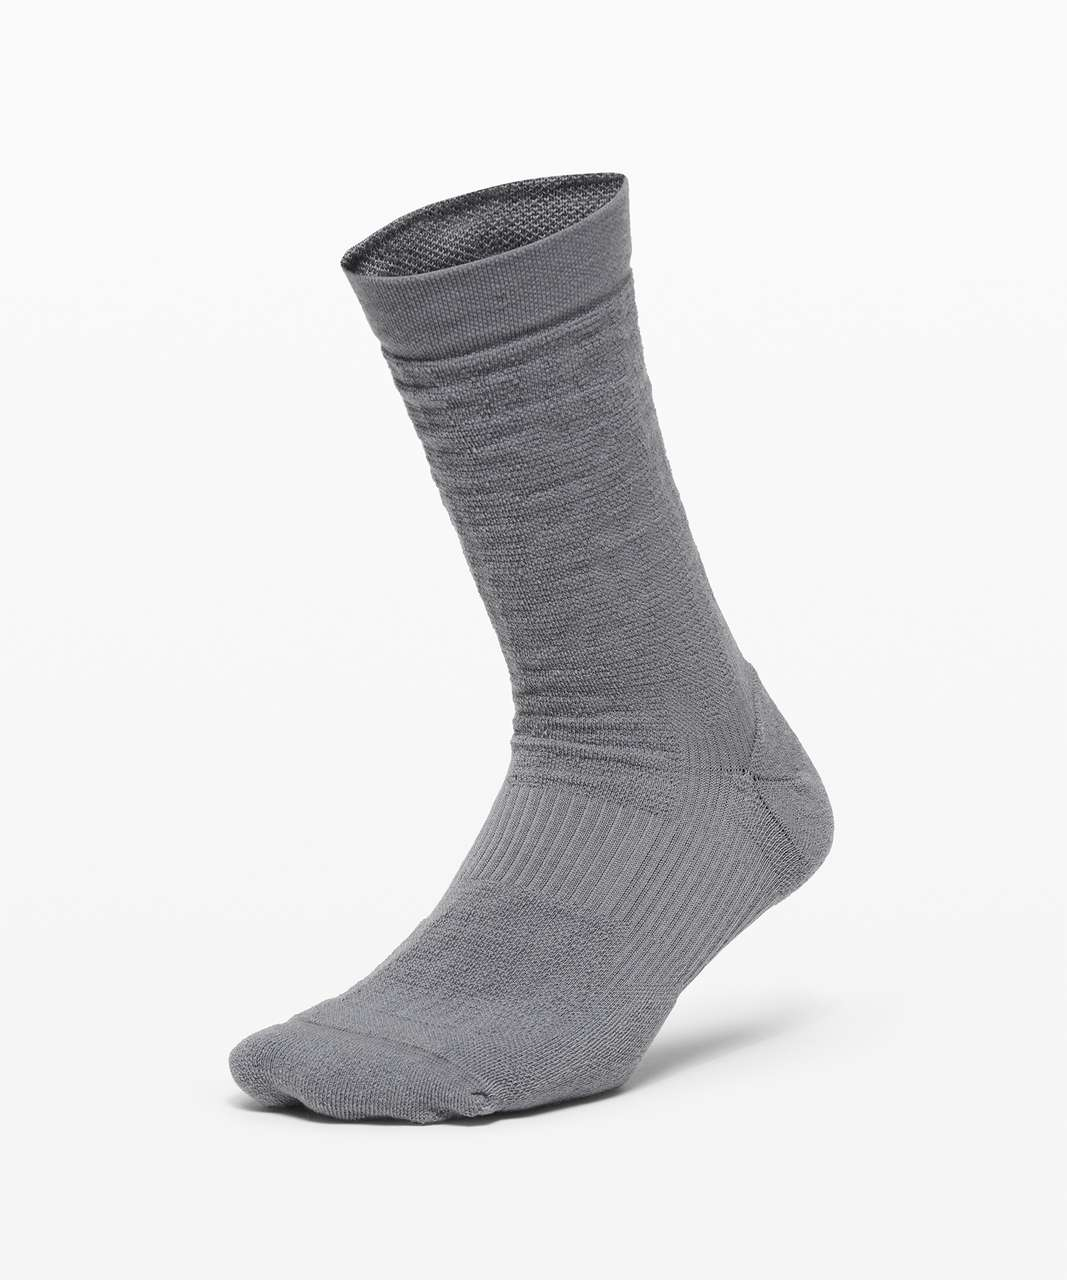 Lululemon Coast to Roam Crew Sock *Wool - Asphalt Grey / Light Cast